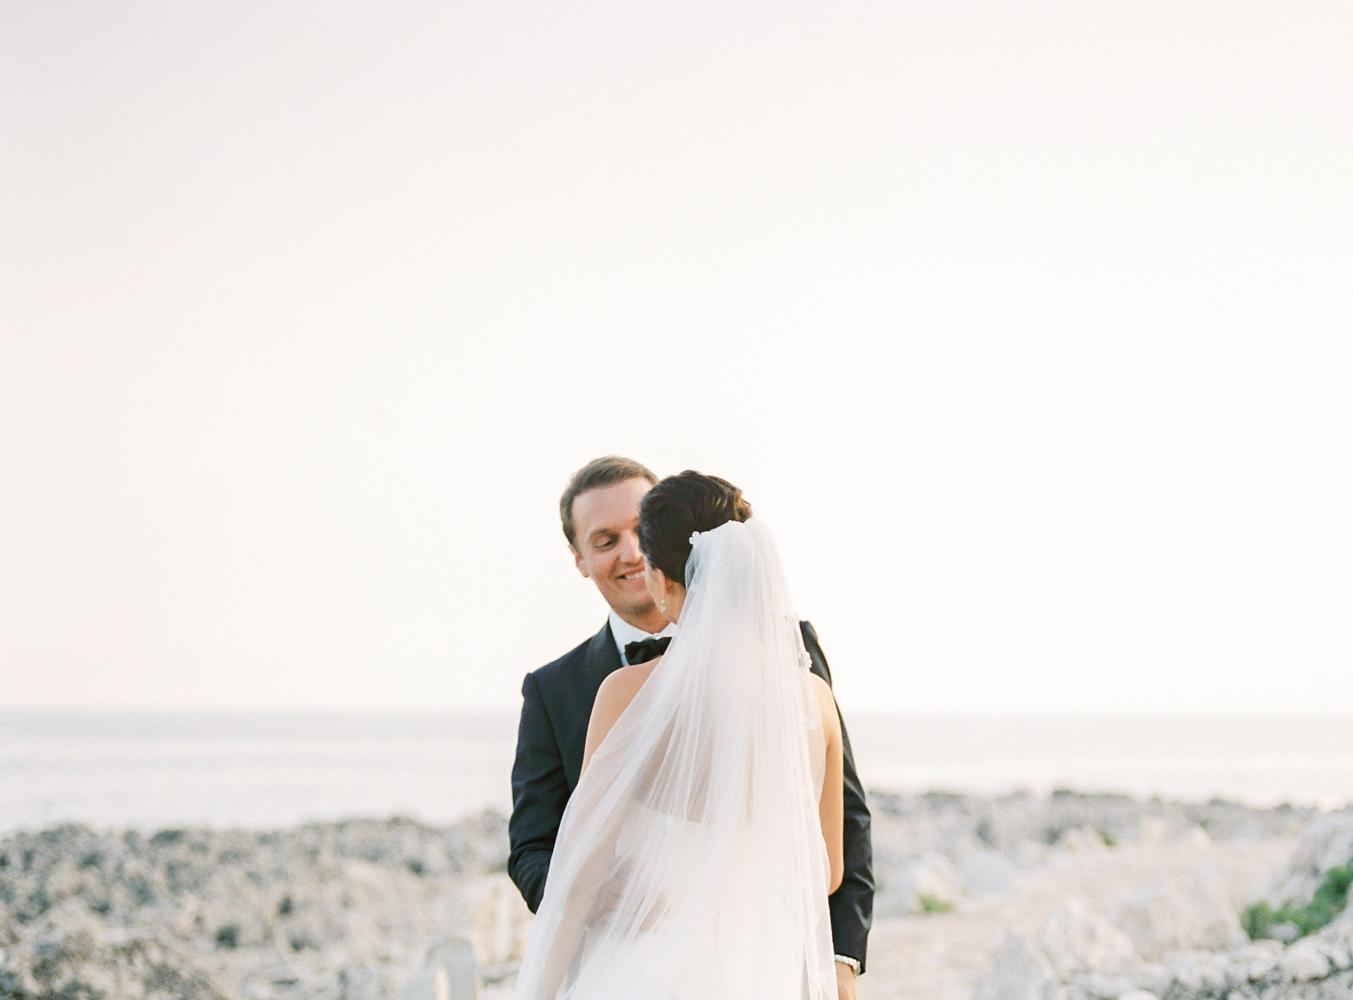 French-Riviera-Wedding-(c)-Rory-Wylie-82.jpg